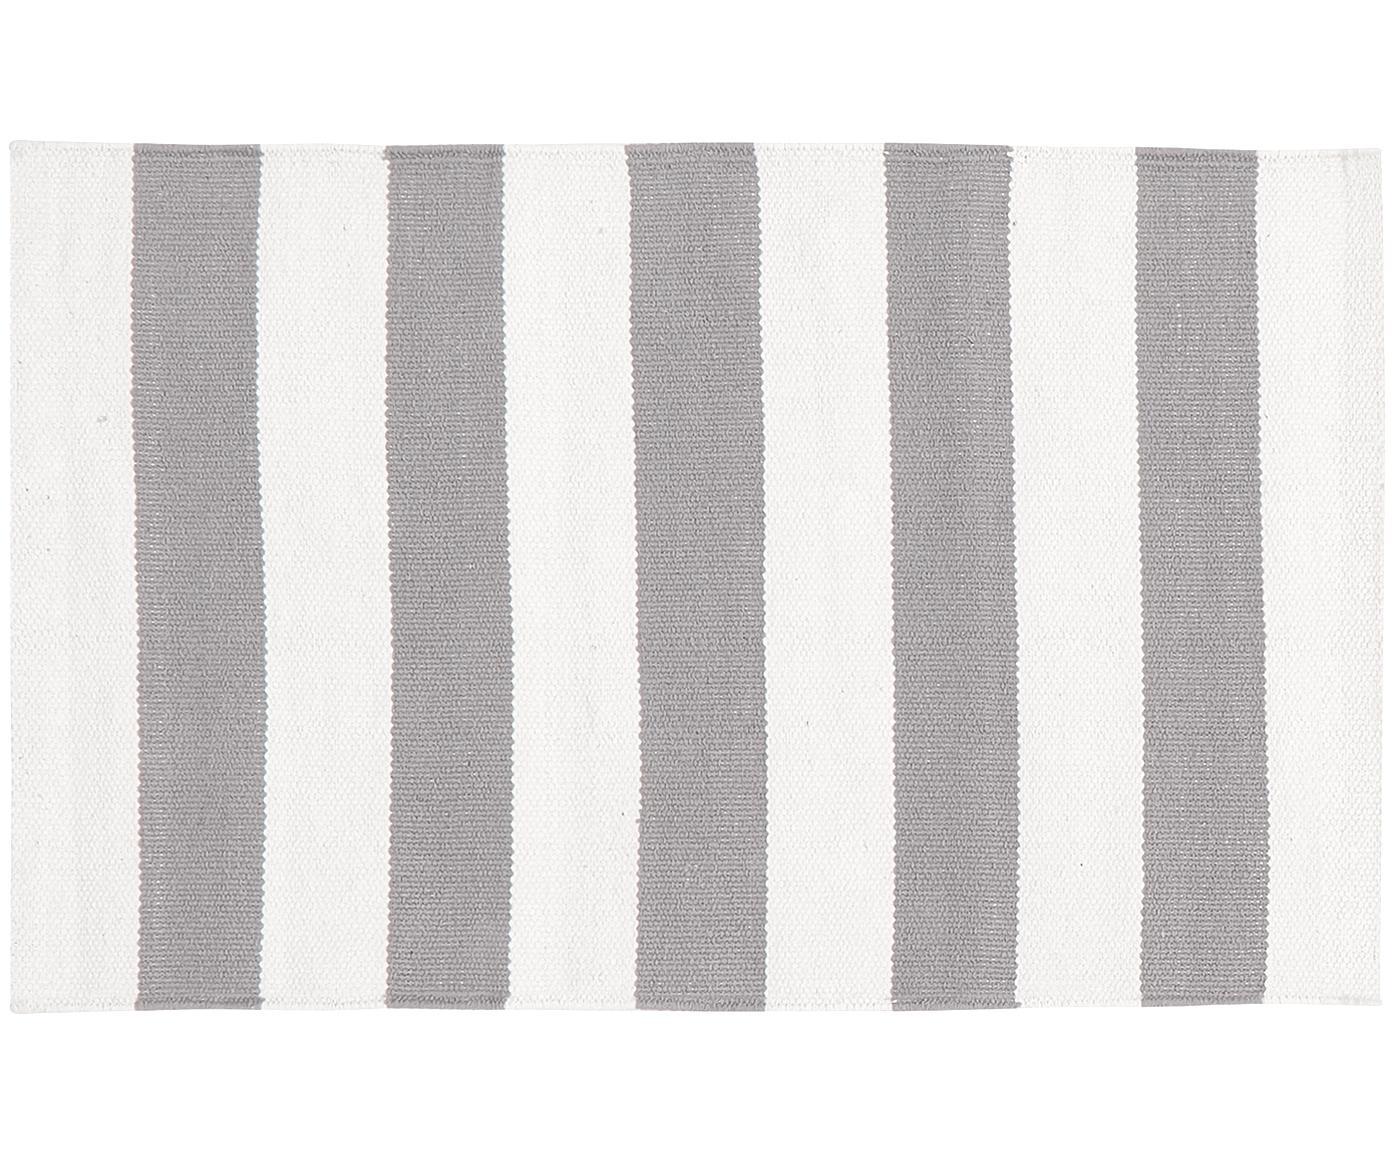 Alfombra artesanal de algodón Blocker, Algodón, Blanco crema, gris claro, An 50 x L 80 cm (Tamaño XXS)